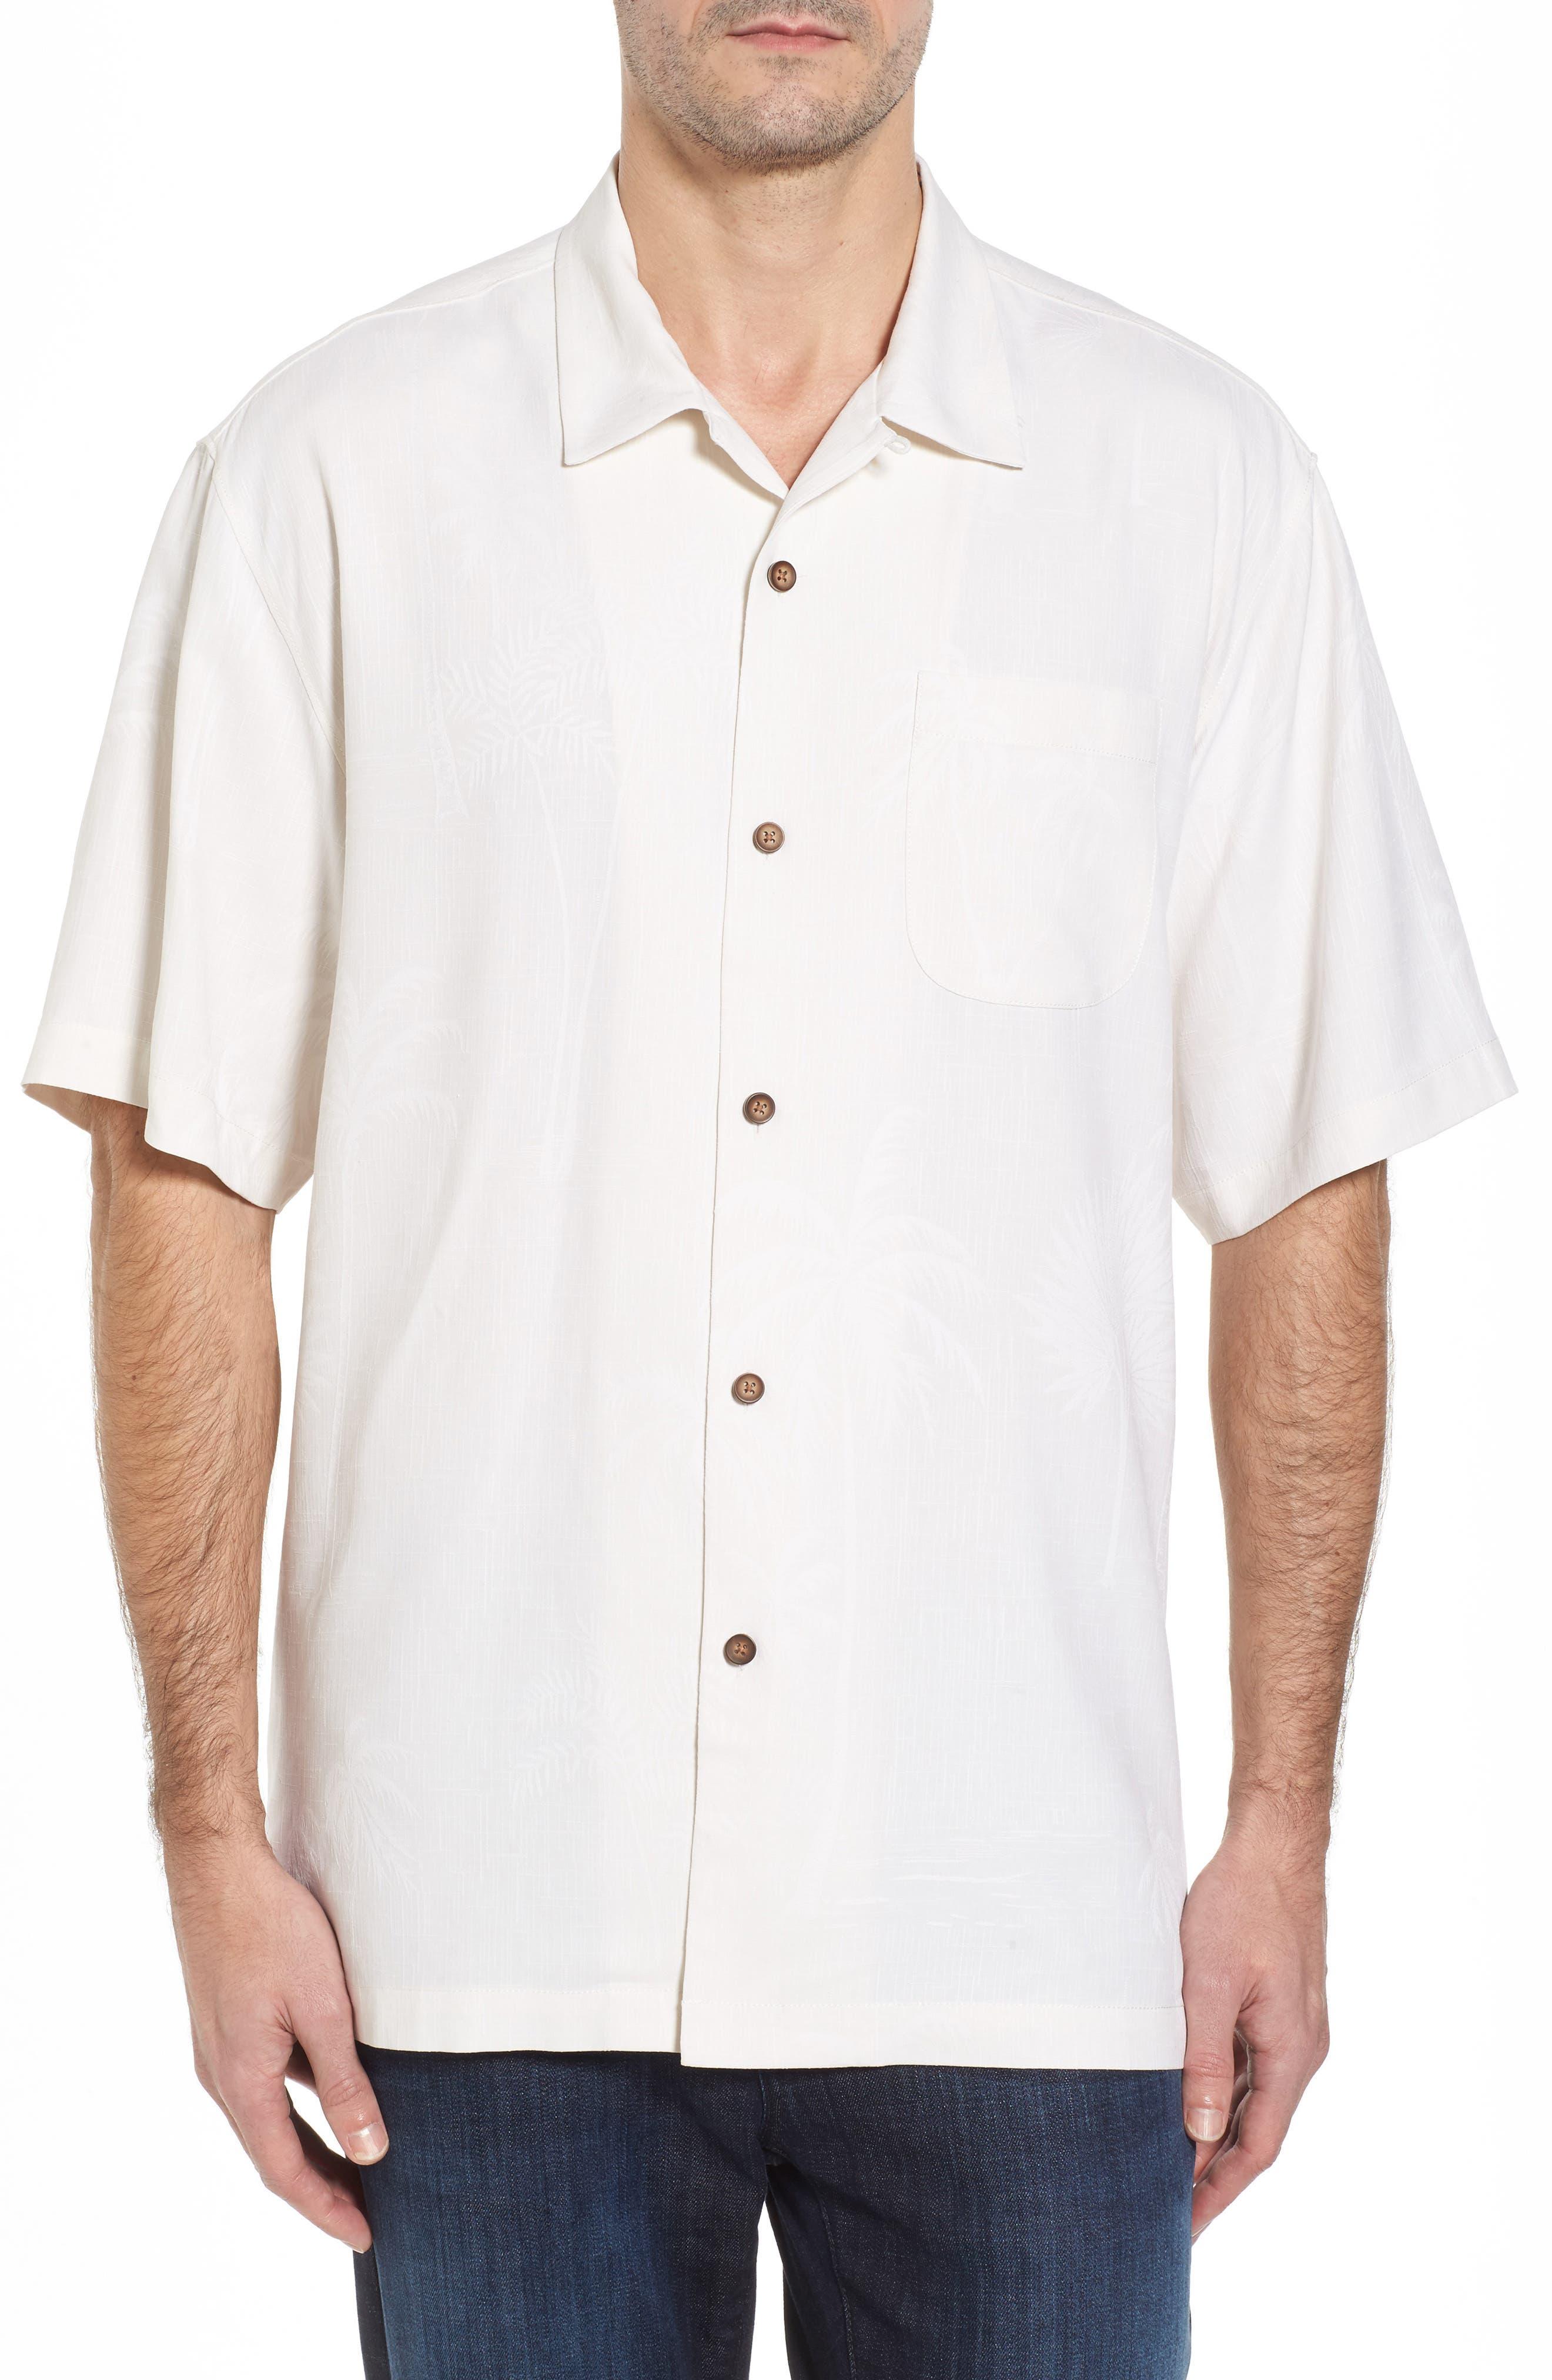 Offshore Sails Silk Camp Shirt,                         Main,                         color, 100